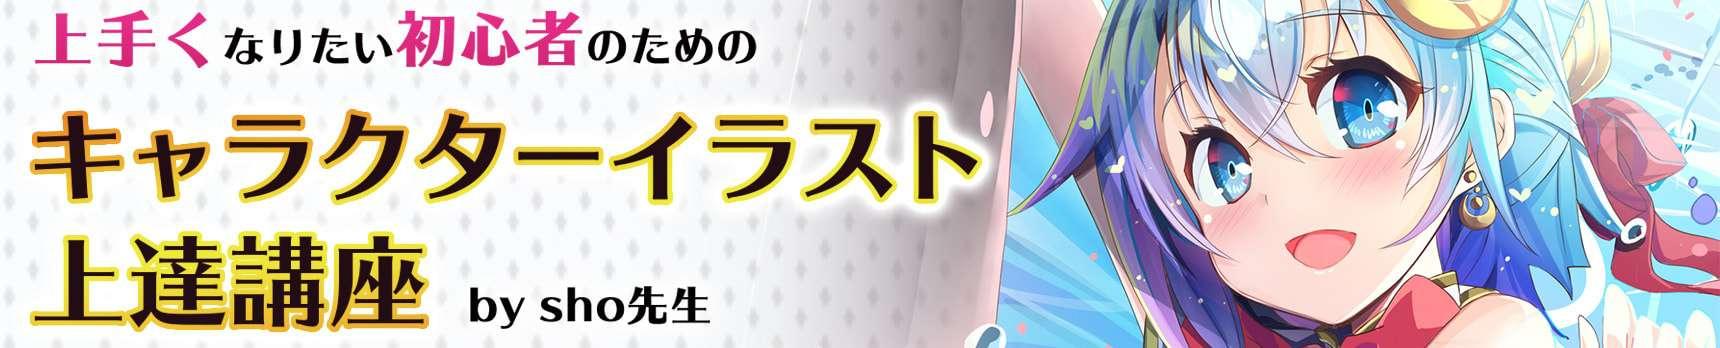 Sho banner pc